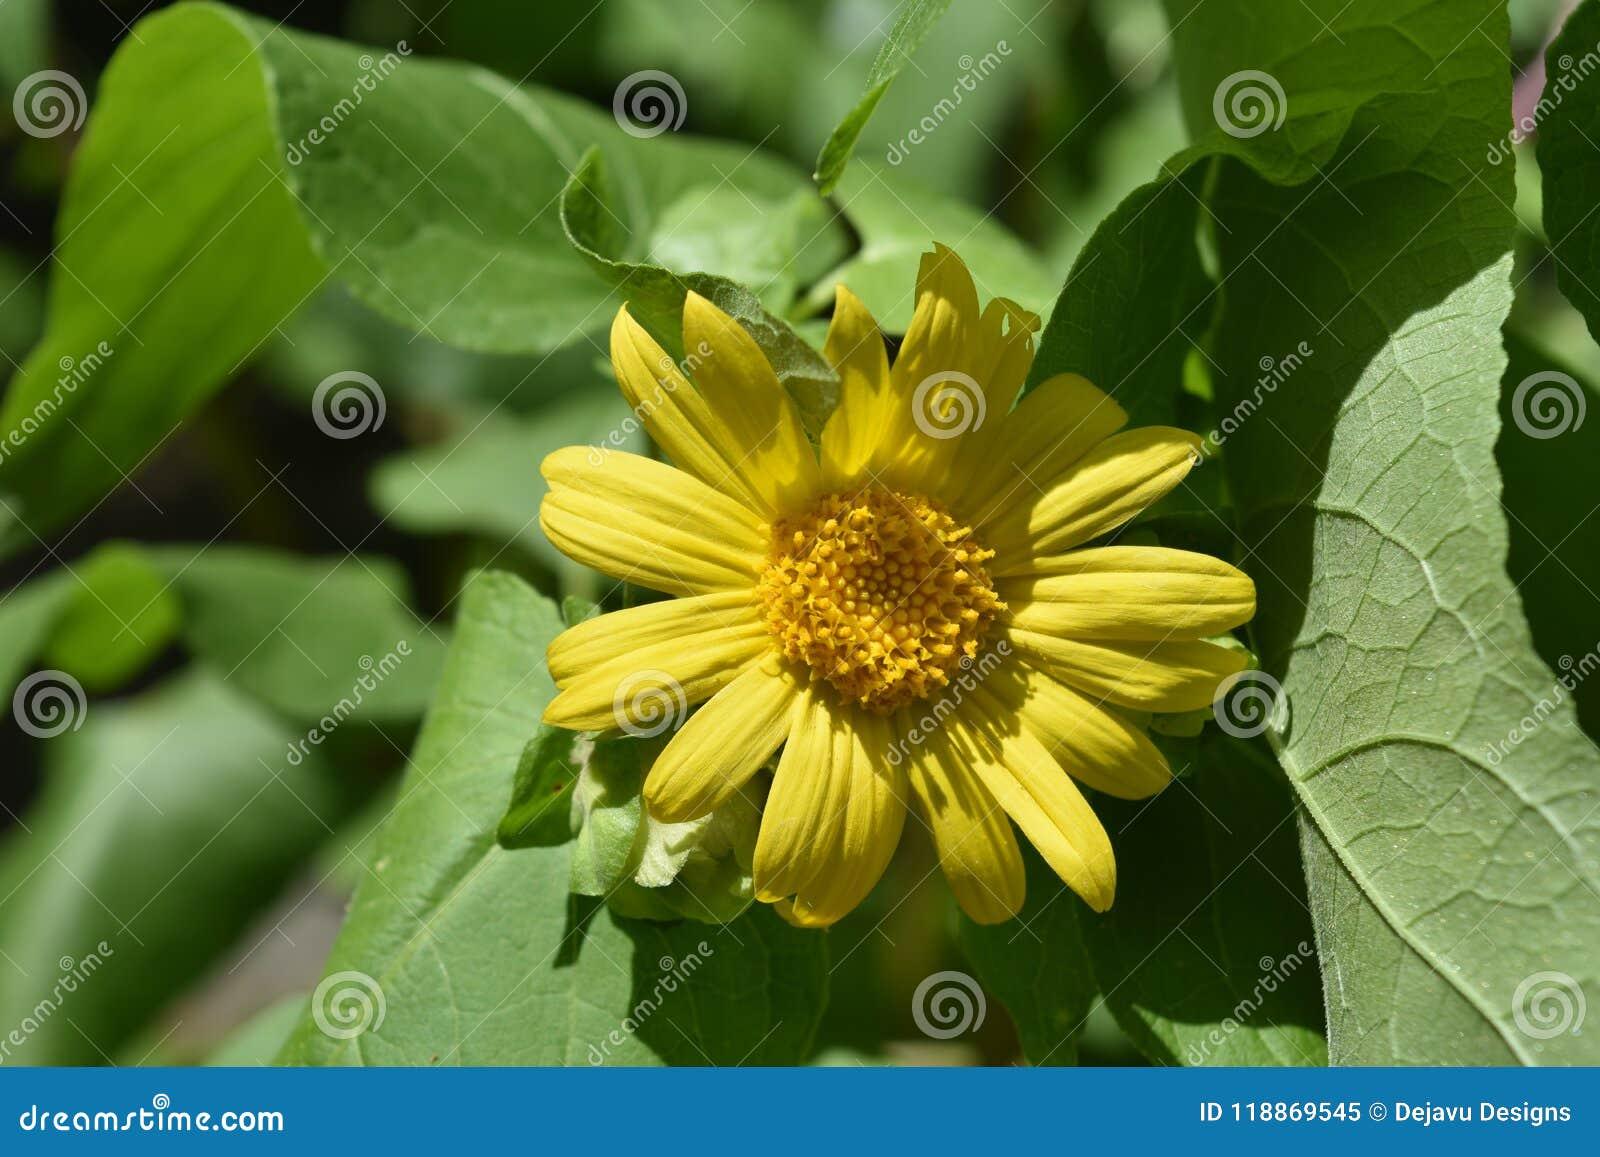 Beautiful herbal yellow flowers called leopards bane stock image beautiful herbal yellow flowers called leopards bane mightylinksfo